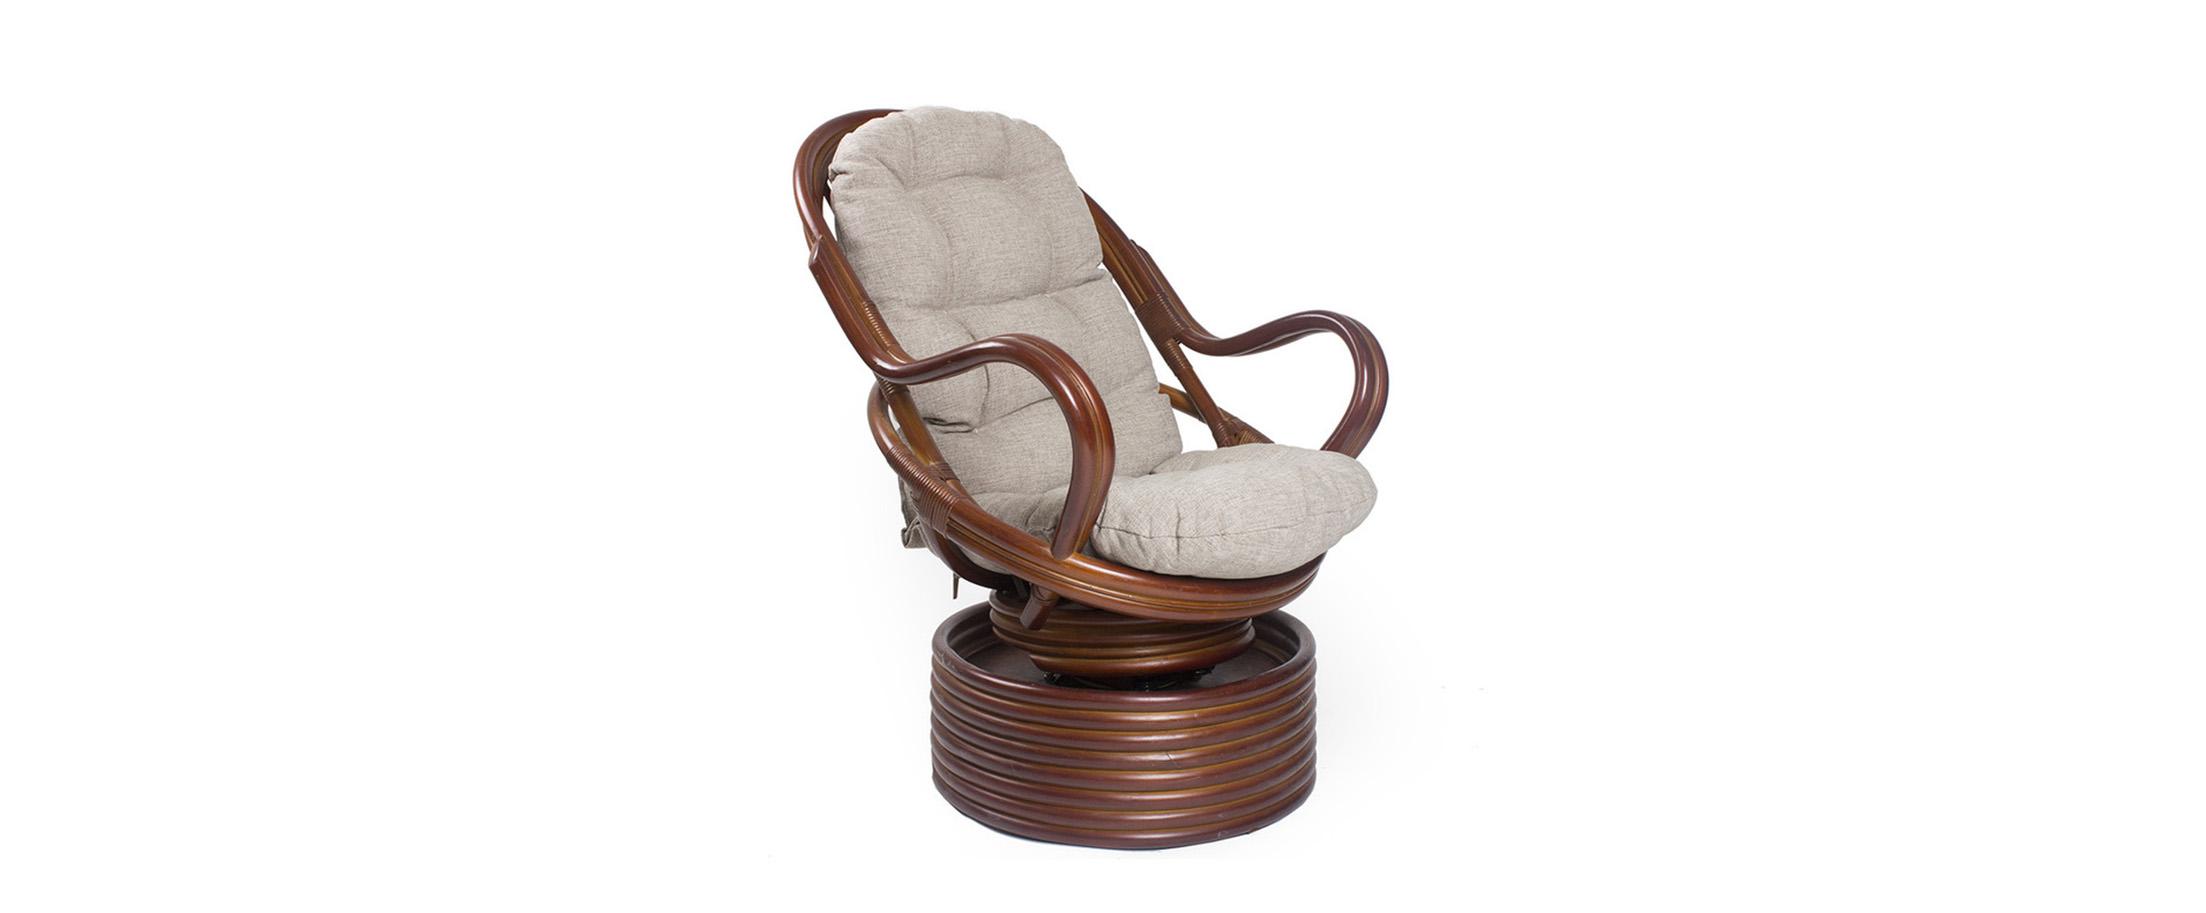 Кресло-качалка Davao Модель 364 от MOON TRADE